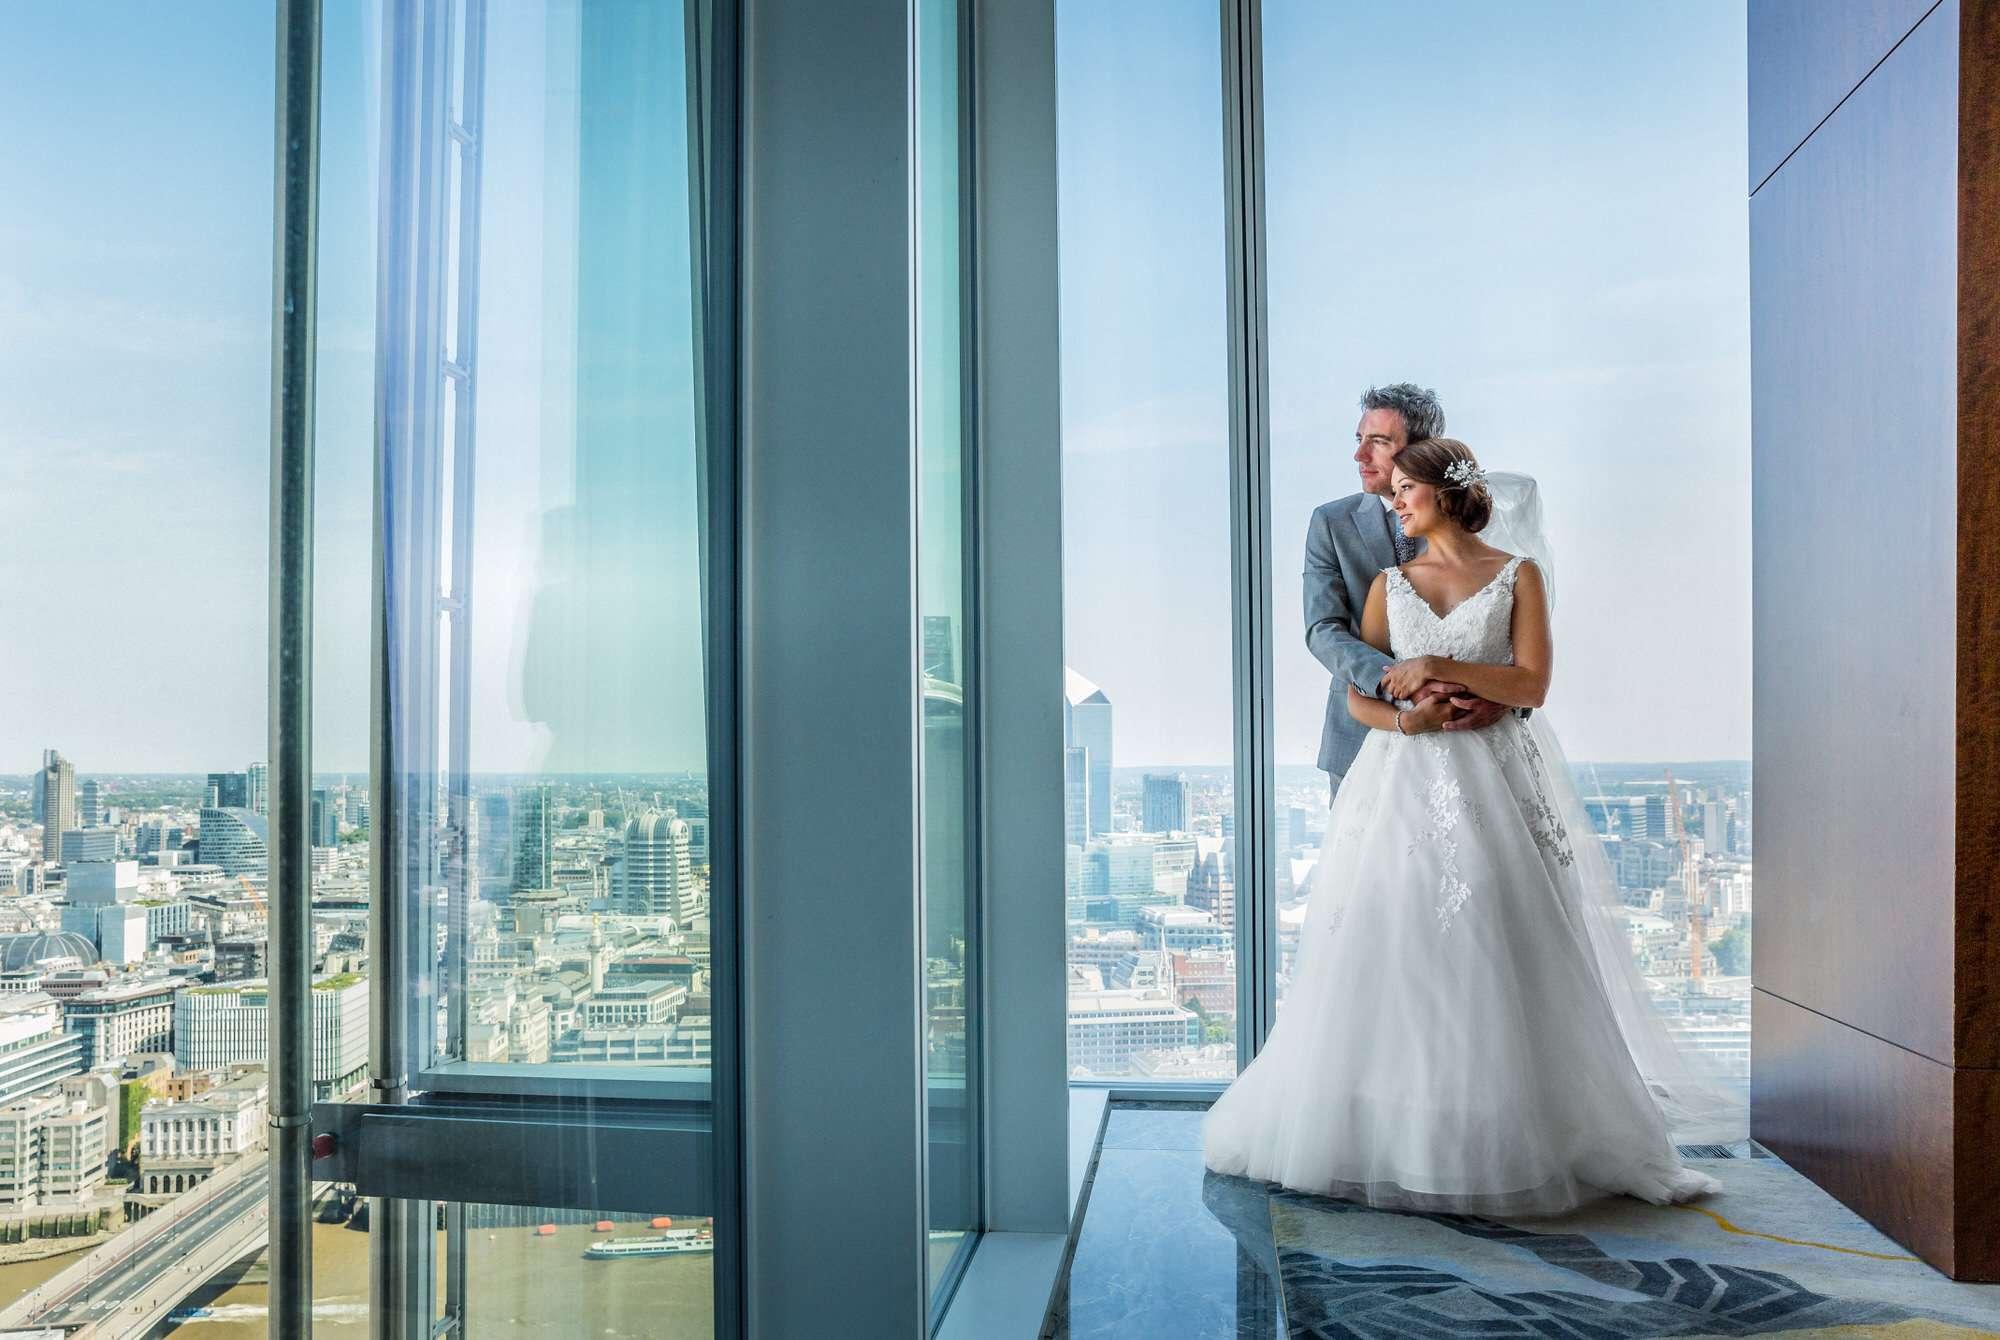 The-Shard-Wedding-photography-Chris-Woodman-Photography-05